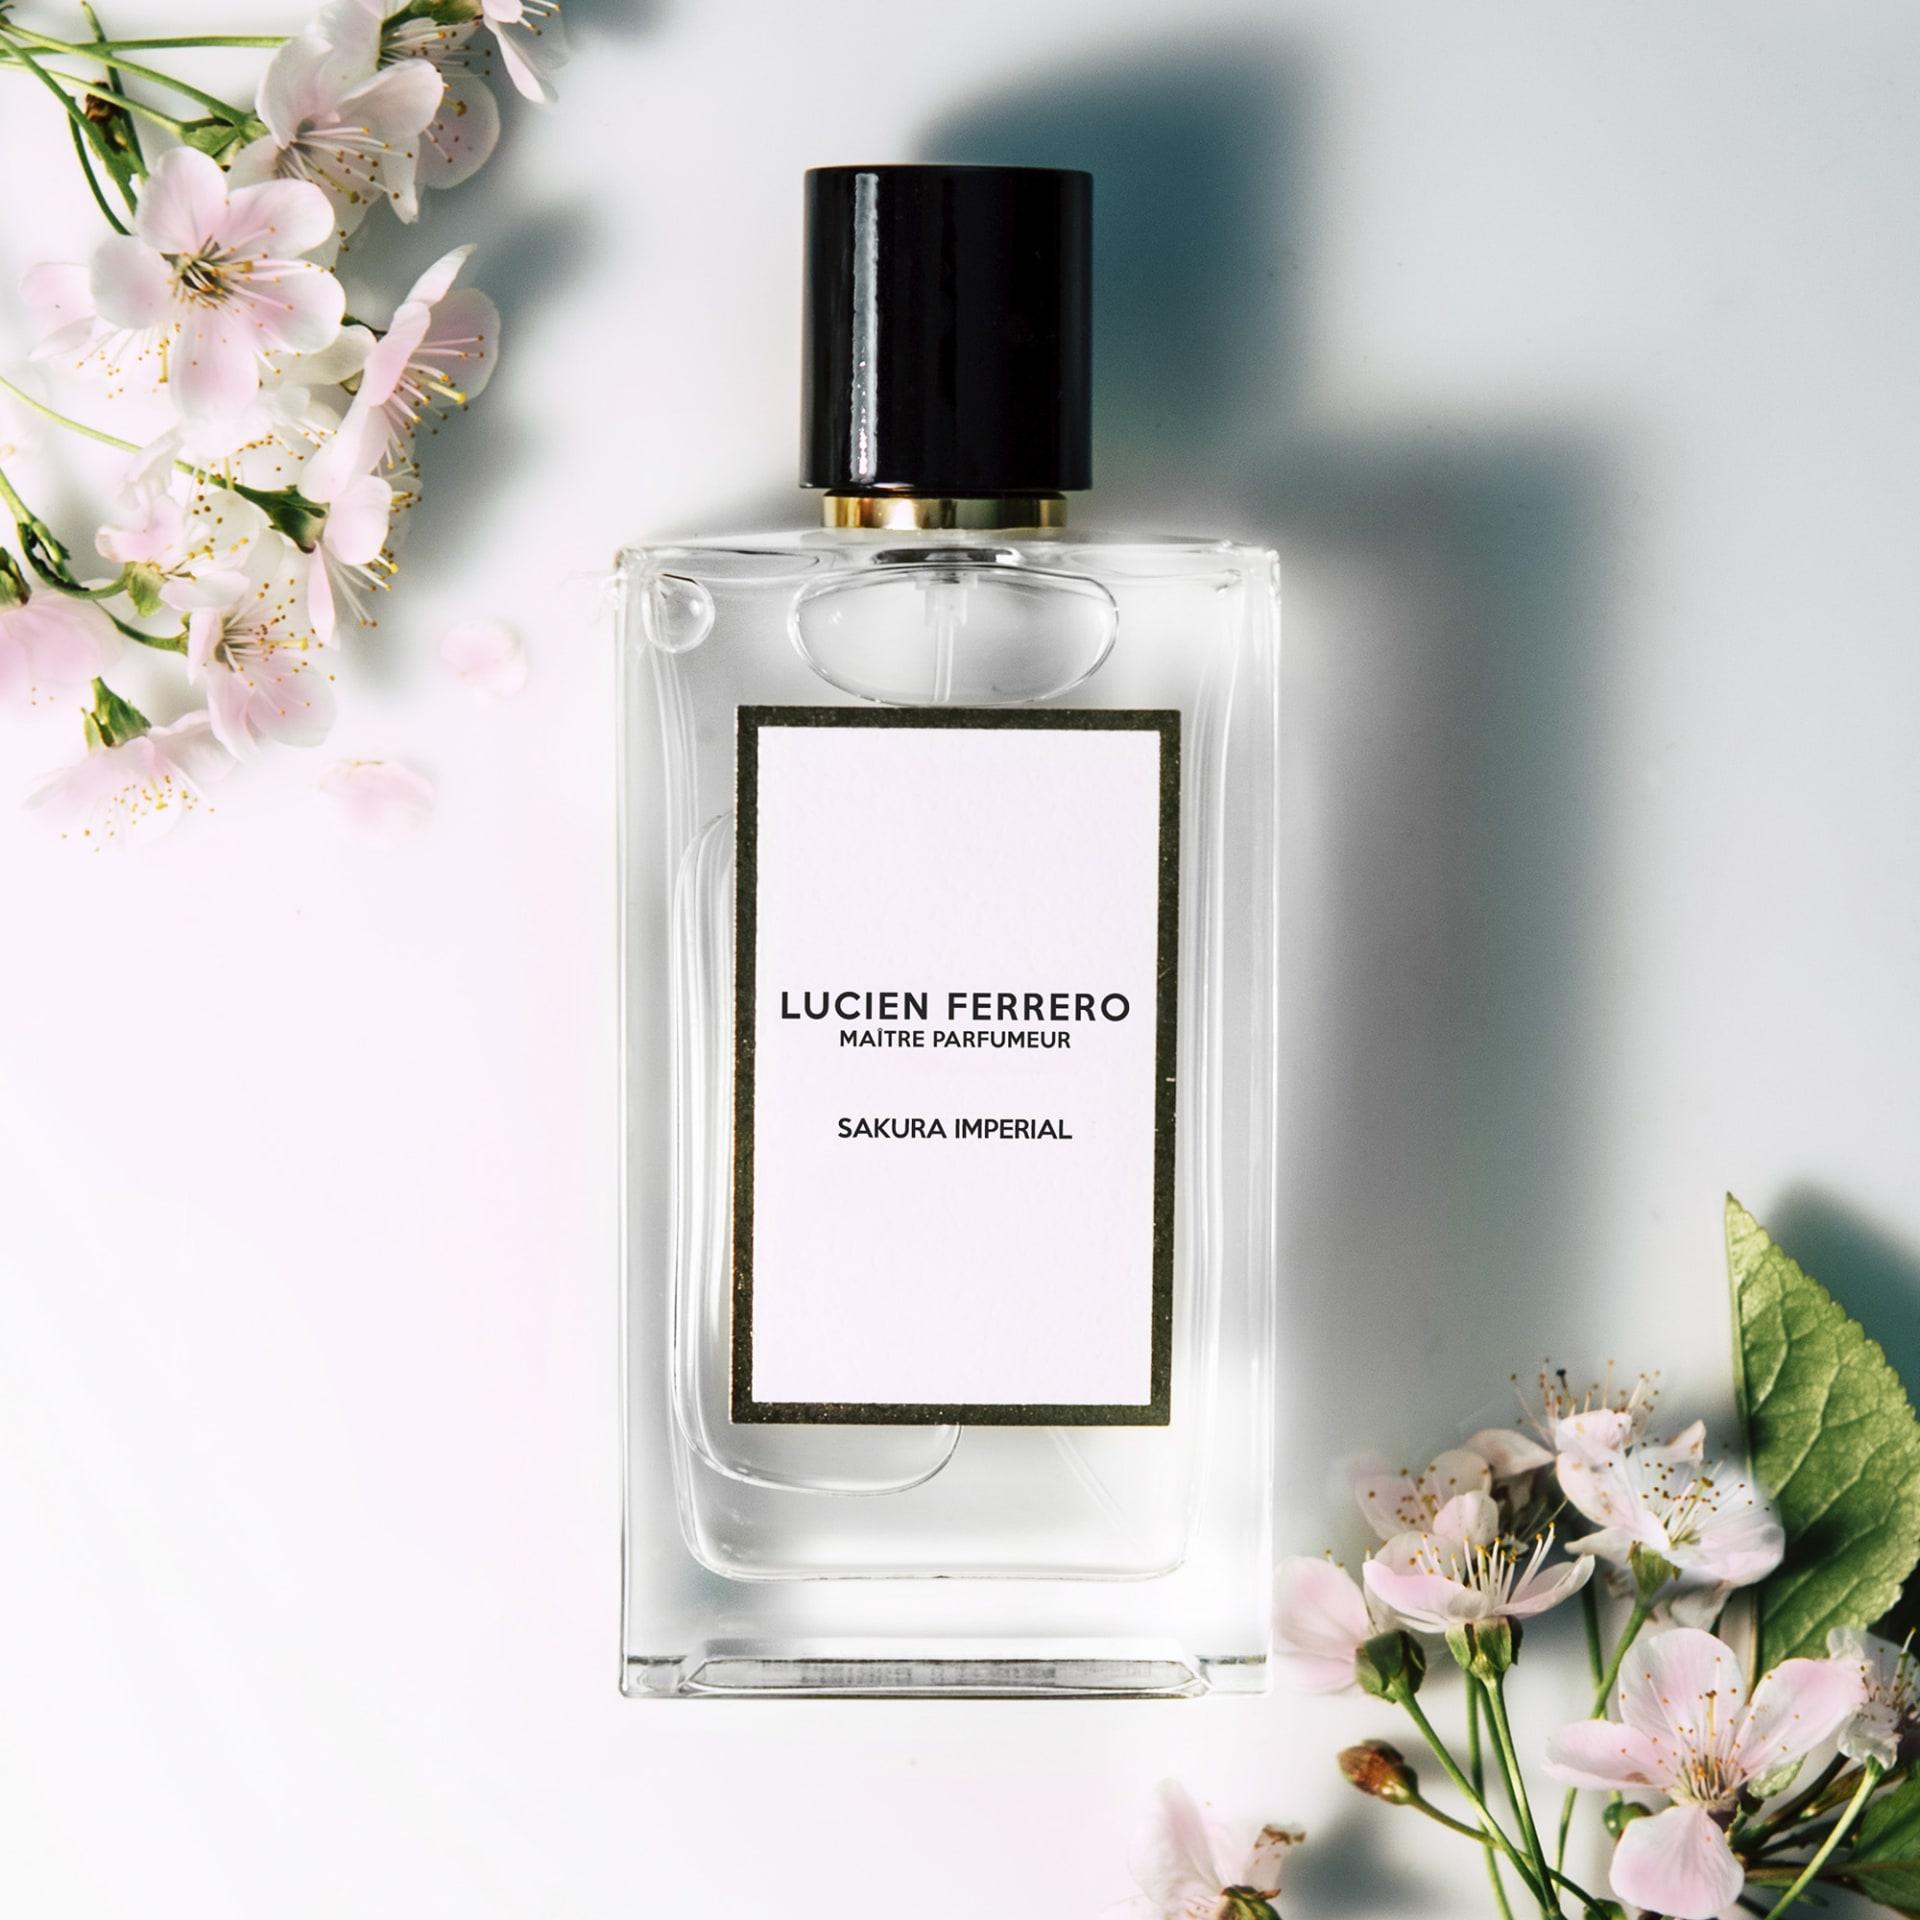 lucien-ferrero-maitre-parfumeur-sakura-imperial